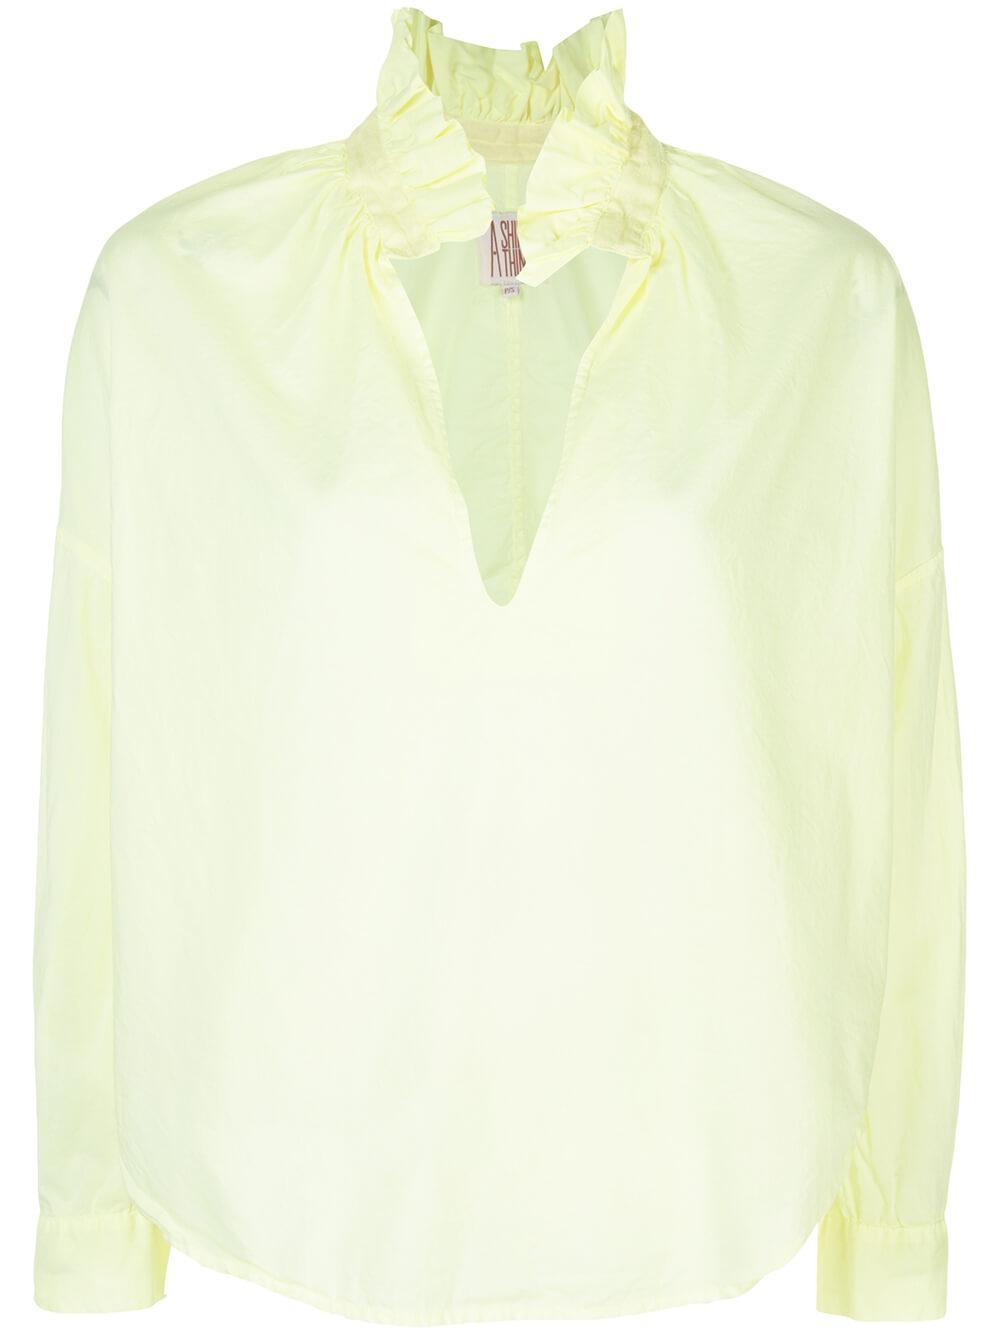 Penelope Cabo Ruffle Collar Long Sleeve Top